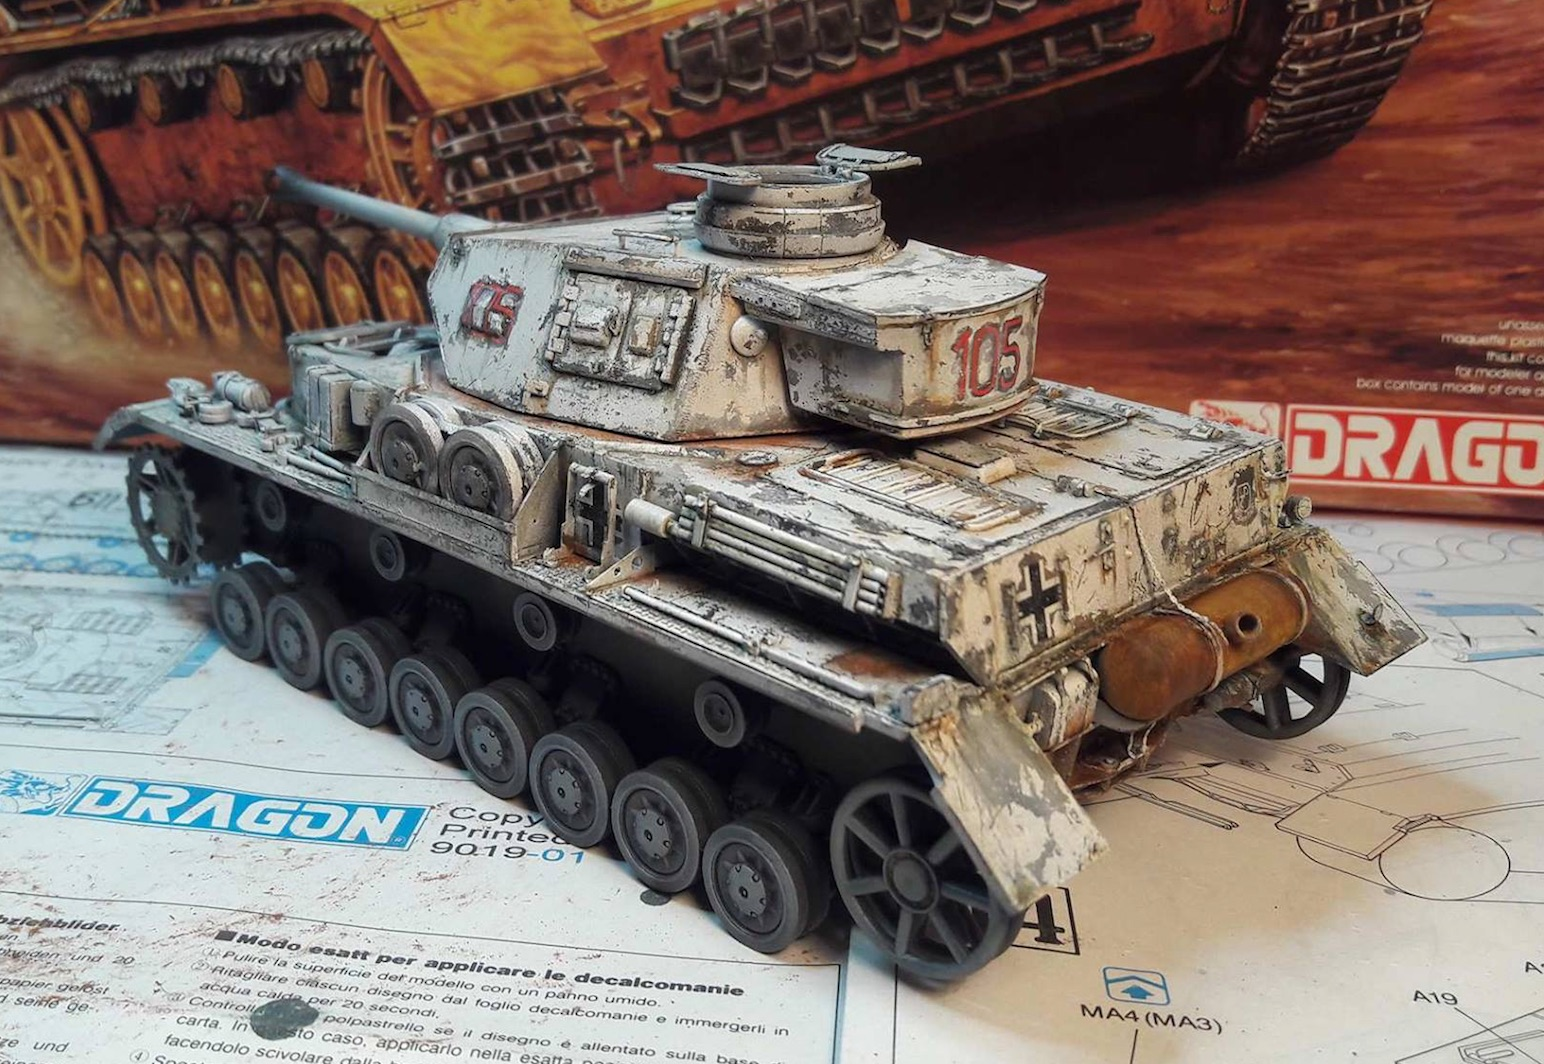 PzKpfw. IV Ausf. F2 - Dragon - Page 2 301574WhiteStrikes2